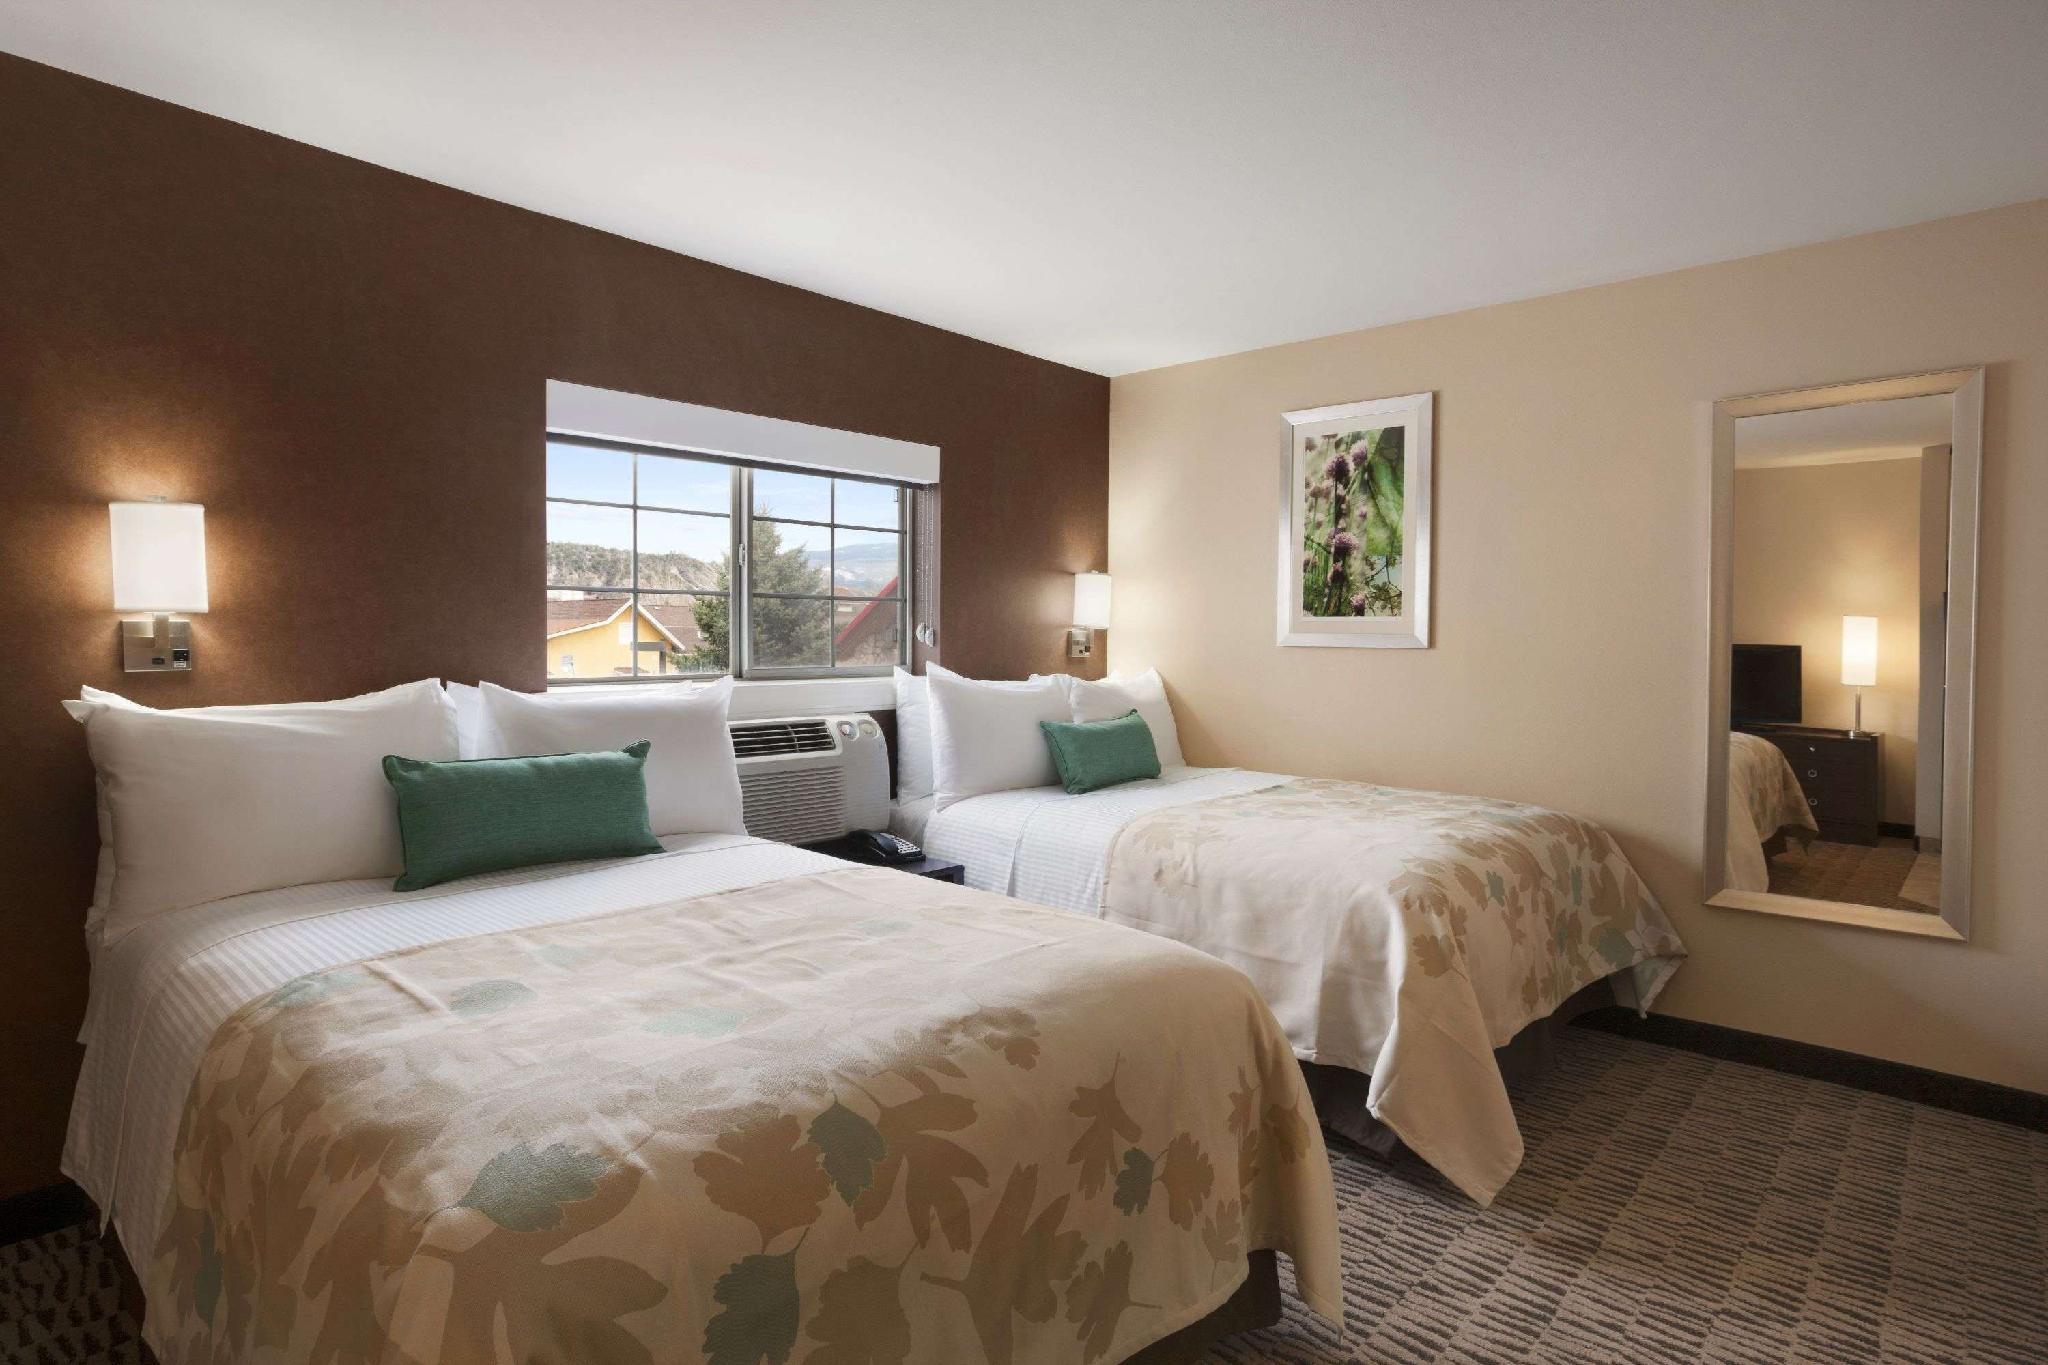 Hawthorn Suites by Wyndham Eagle, CO, Eagle